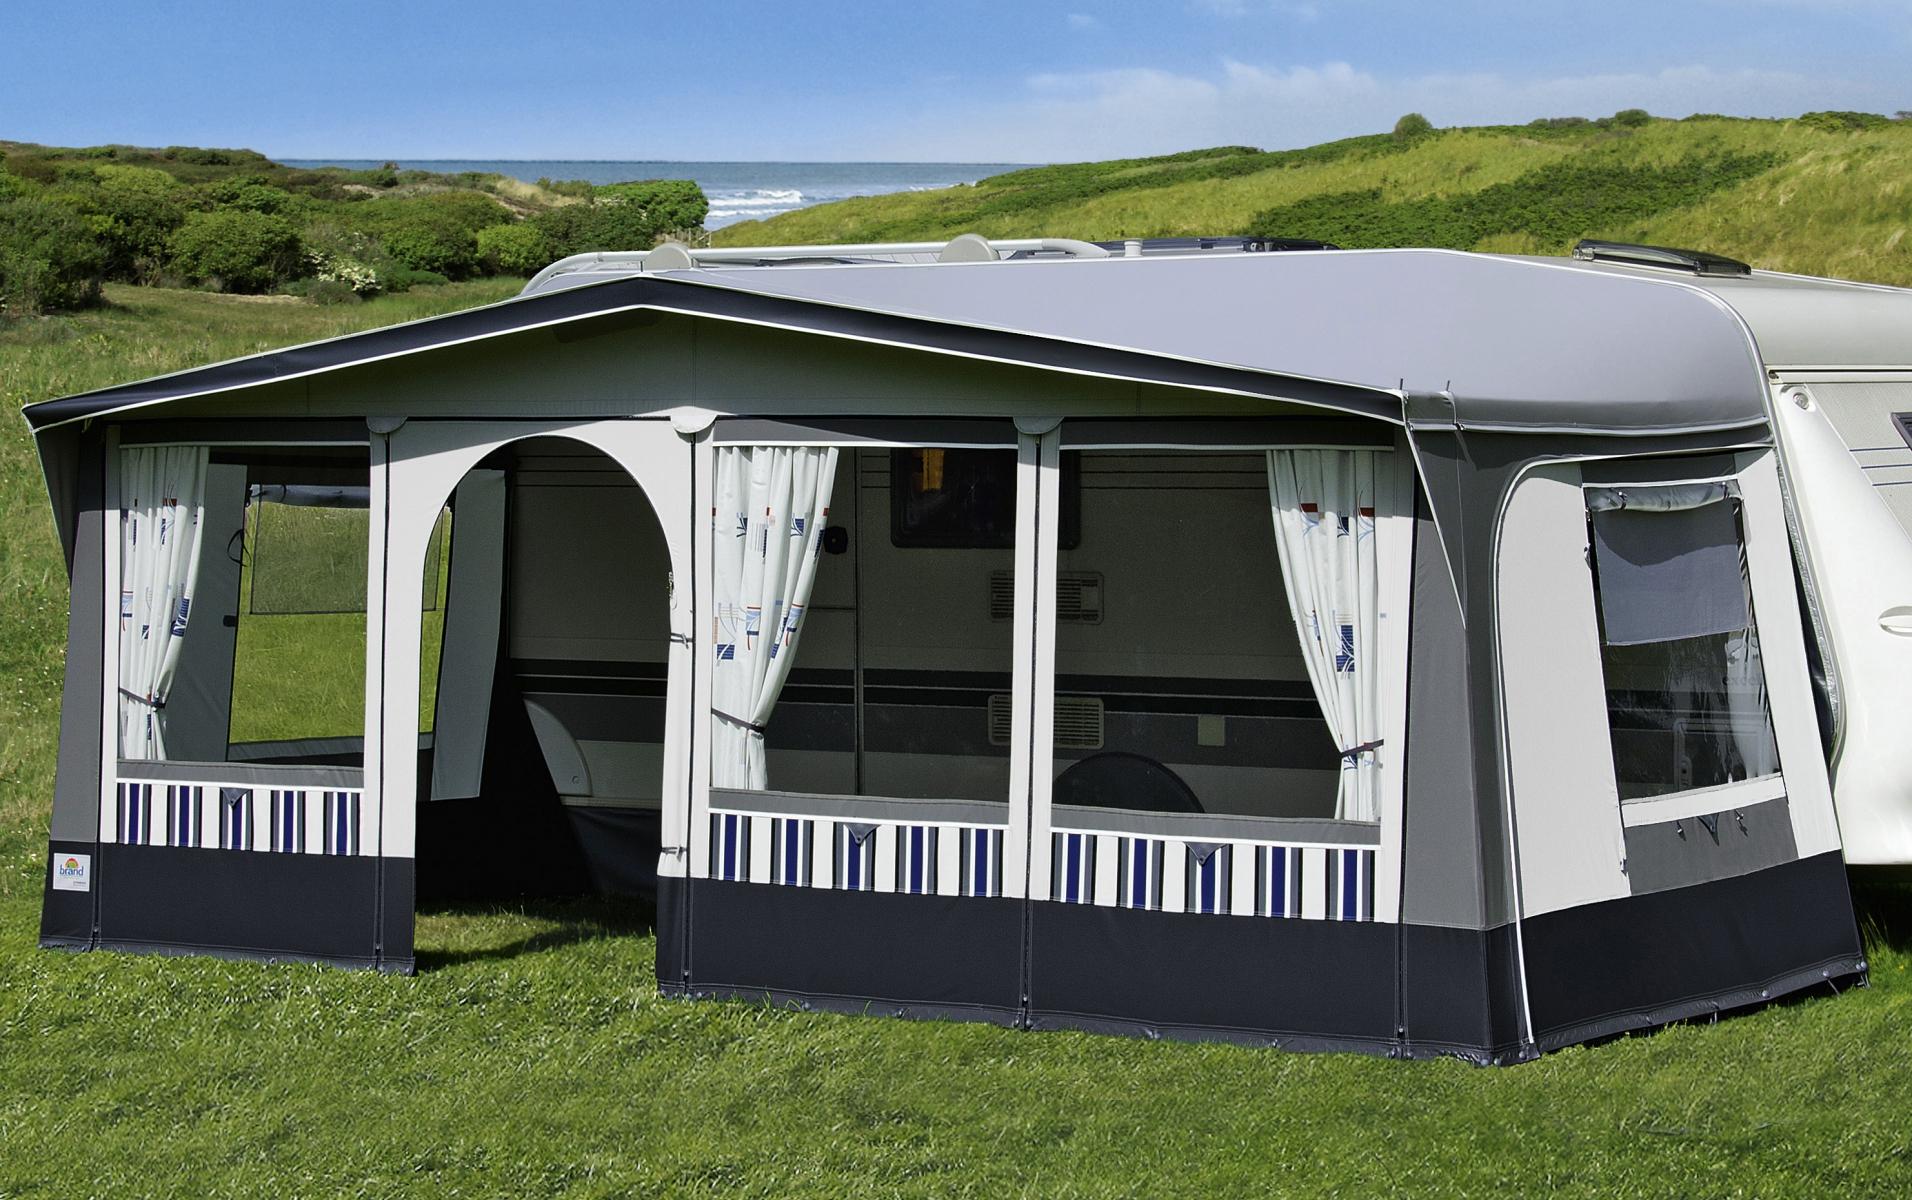 berlin lichterfelde fritz berger campingbedarf. Black Bedroom Furniture Sets. Home Design Ideas